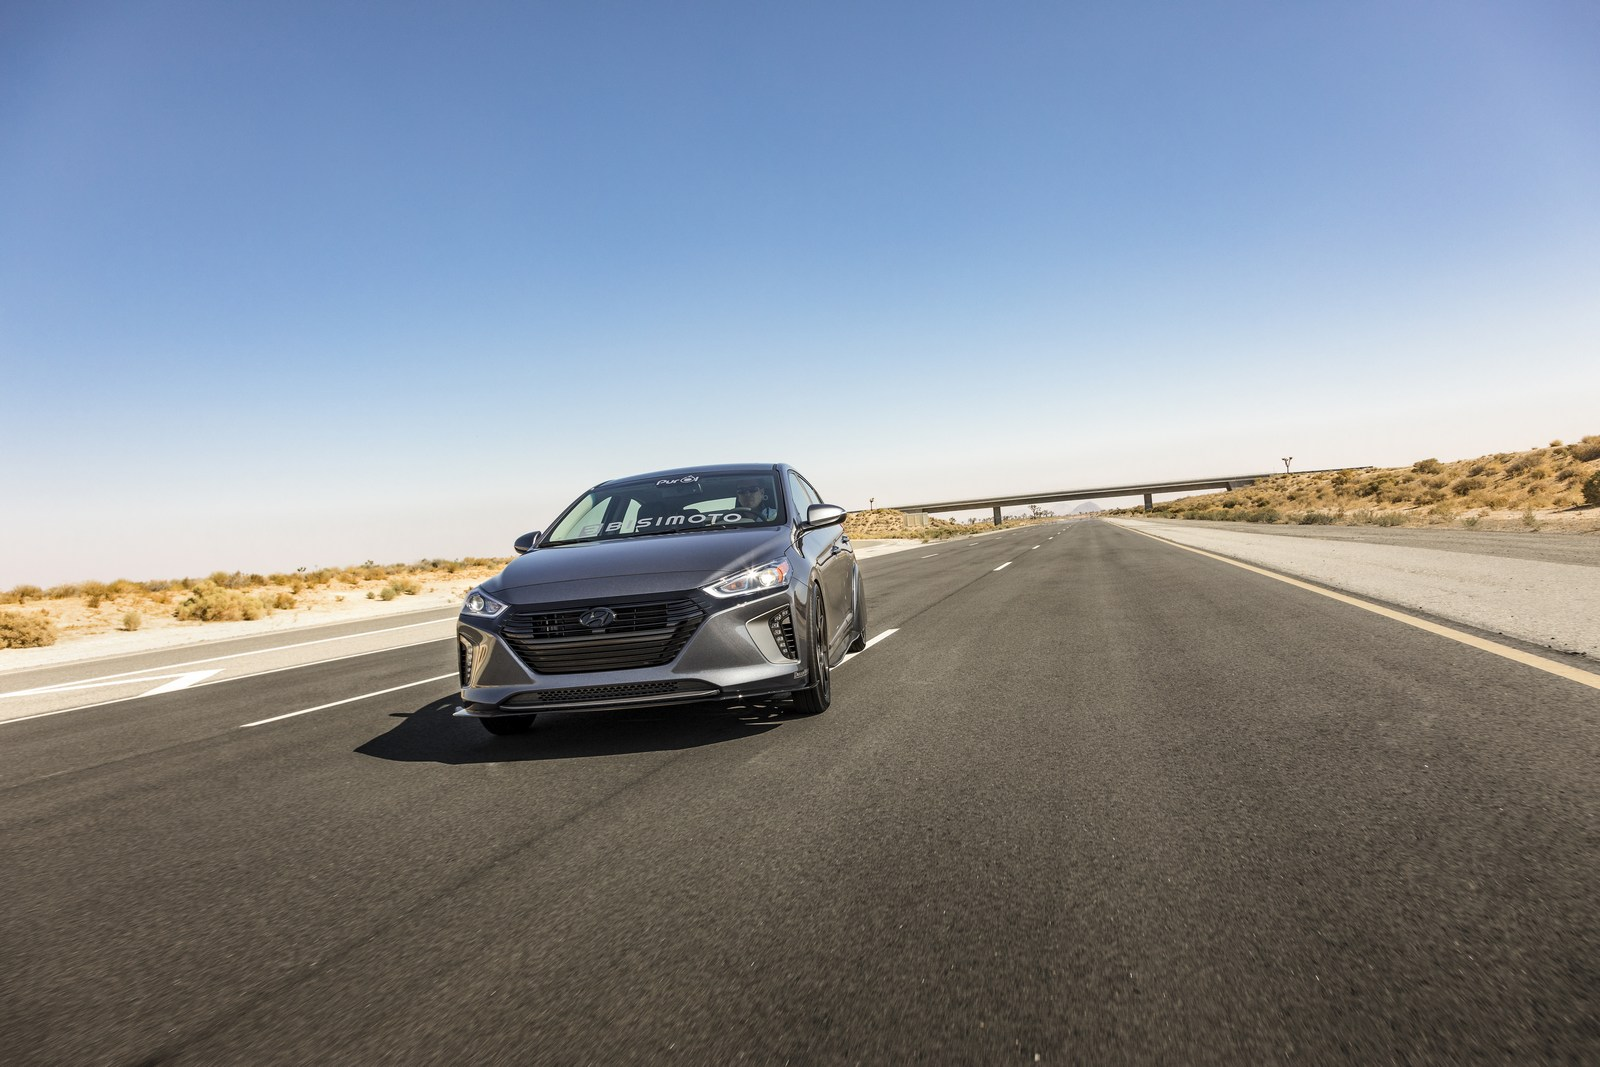 Hyundai-HyperEconiq-Ioniq-Concept-4